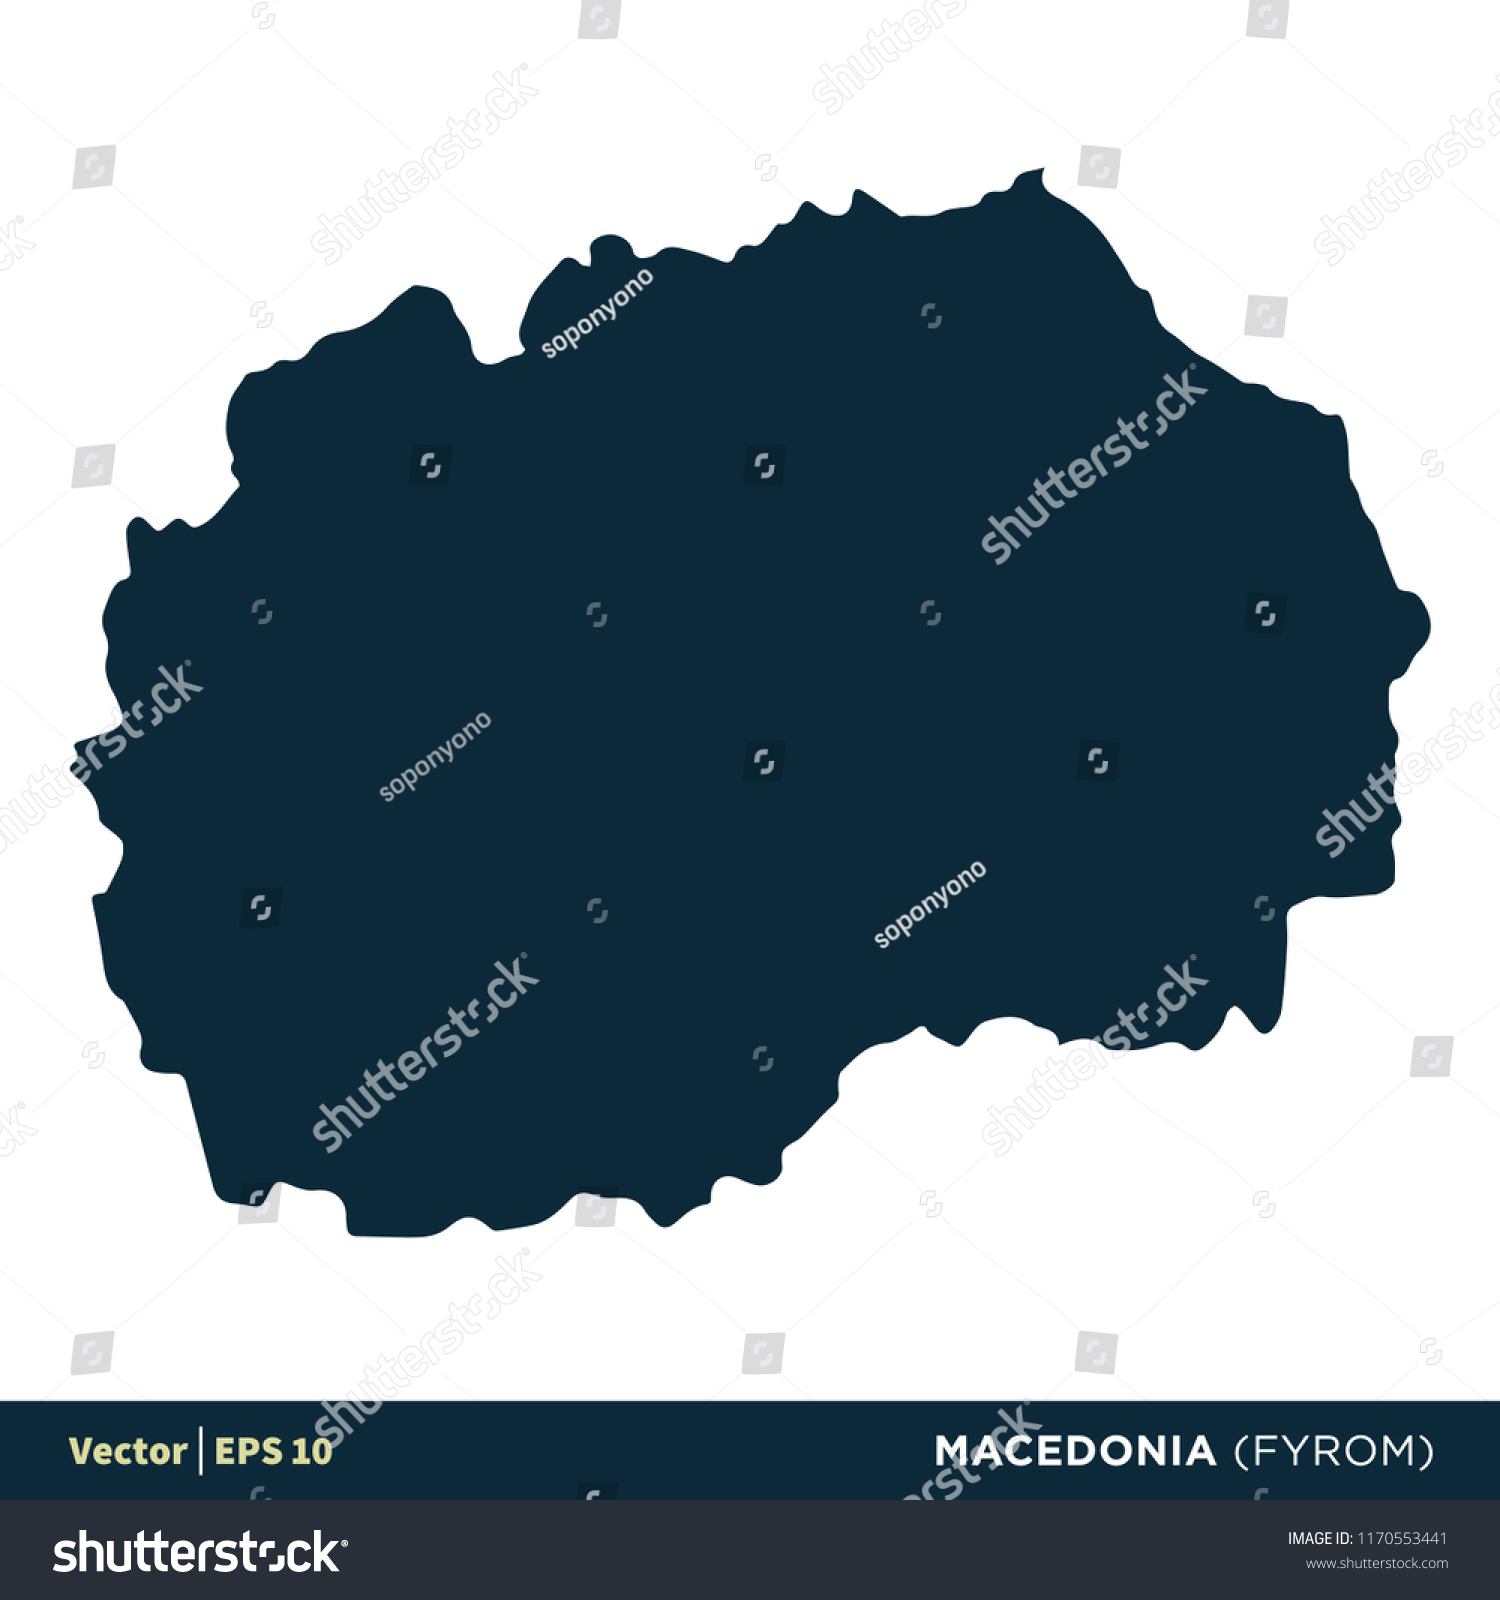 macedonia fyrom europe countries map vector stock vector royalty